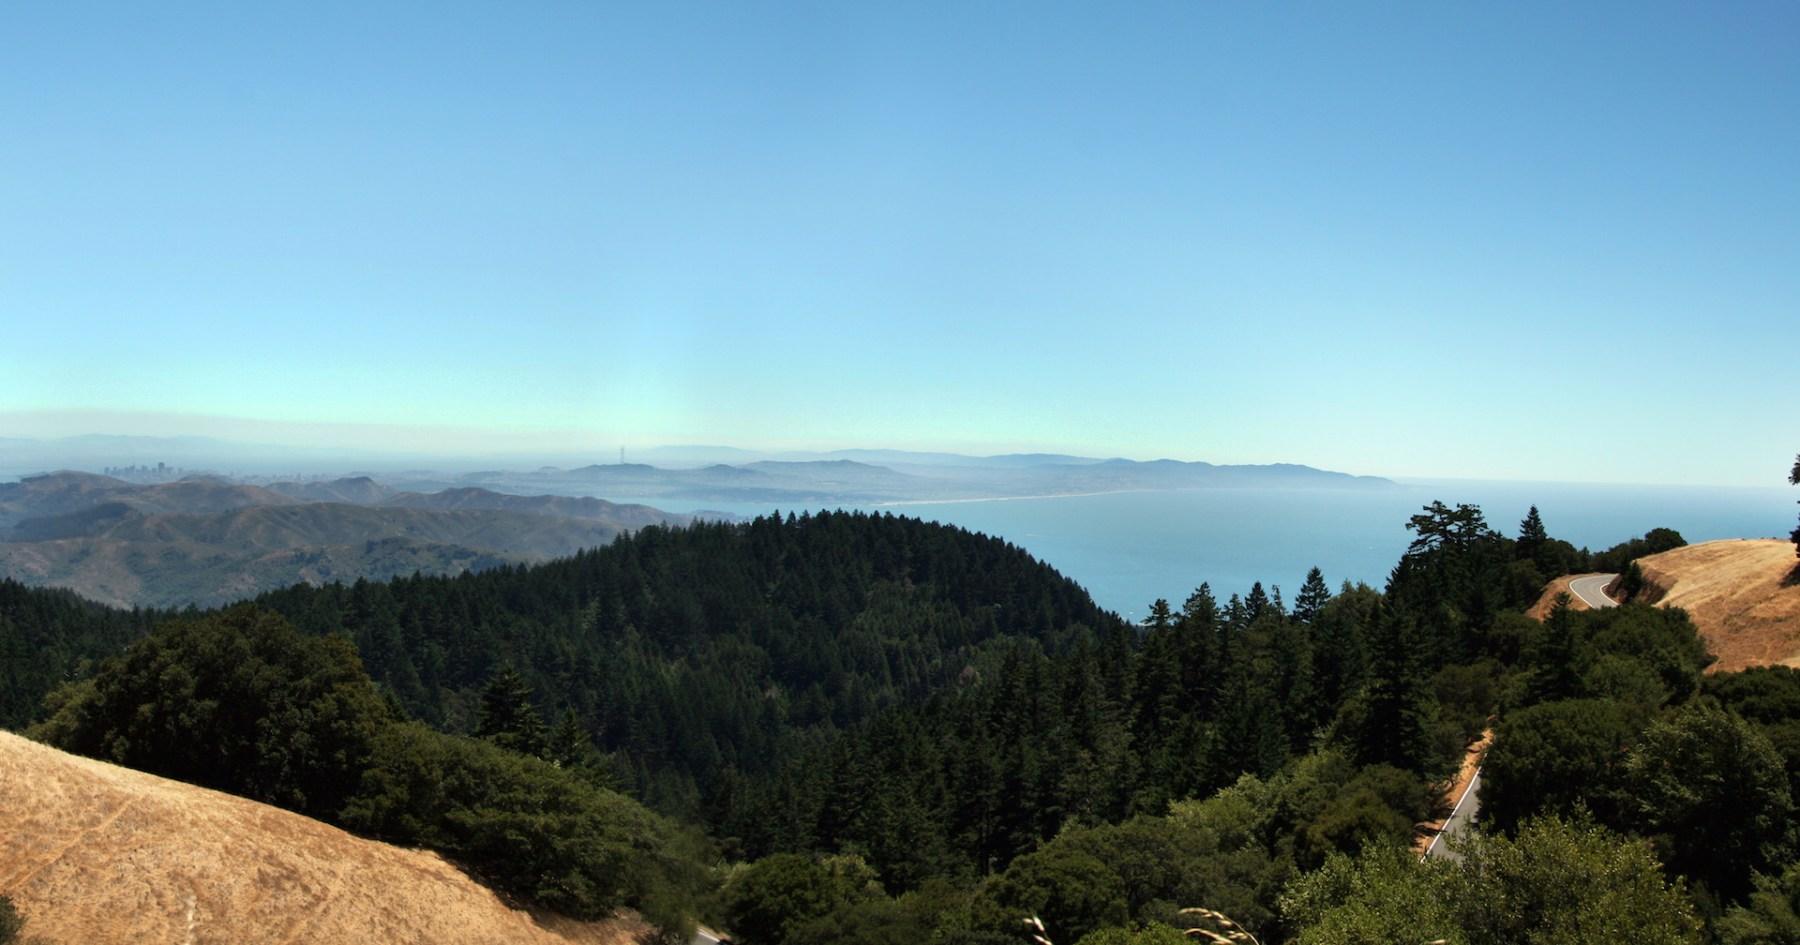 The Bay Area's Best Bike Ride